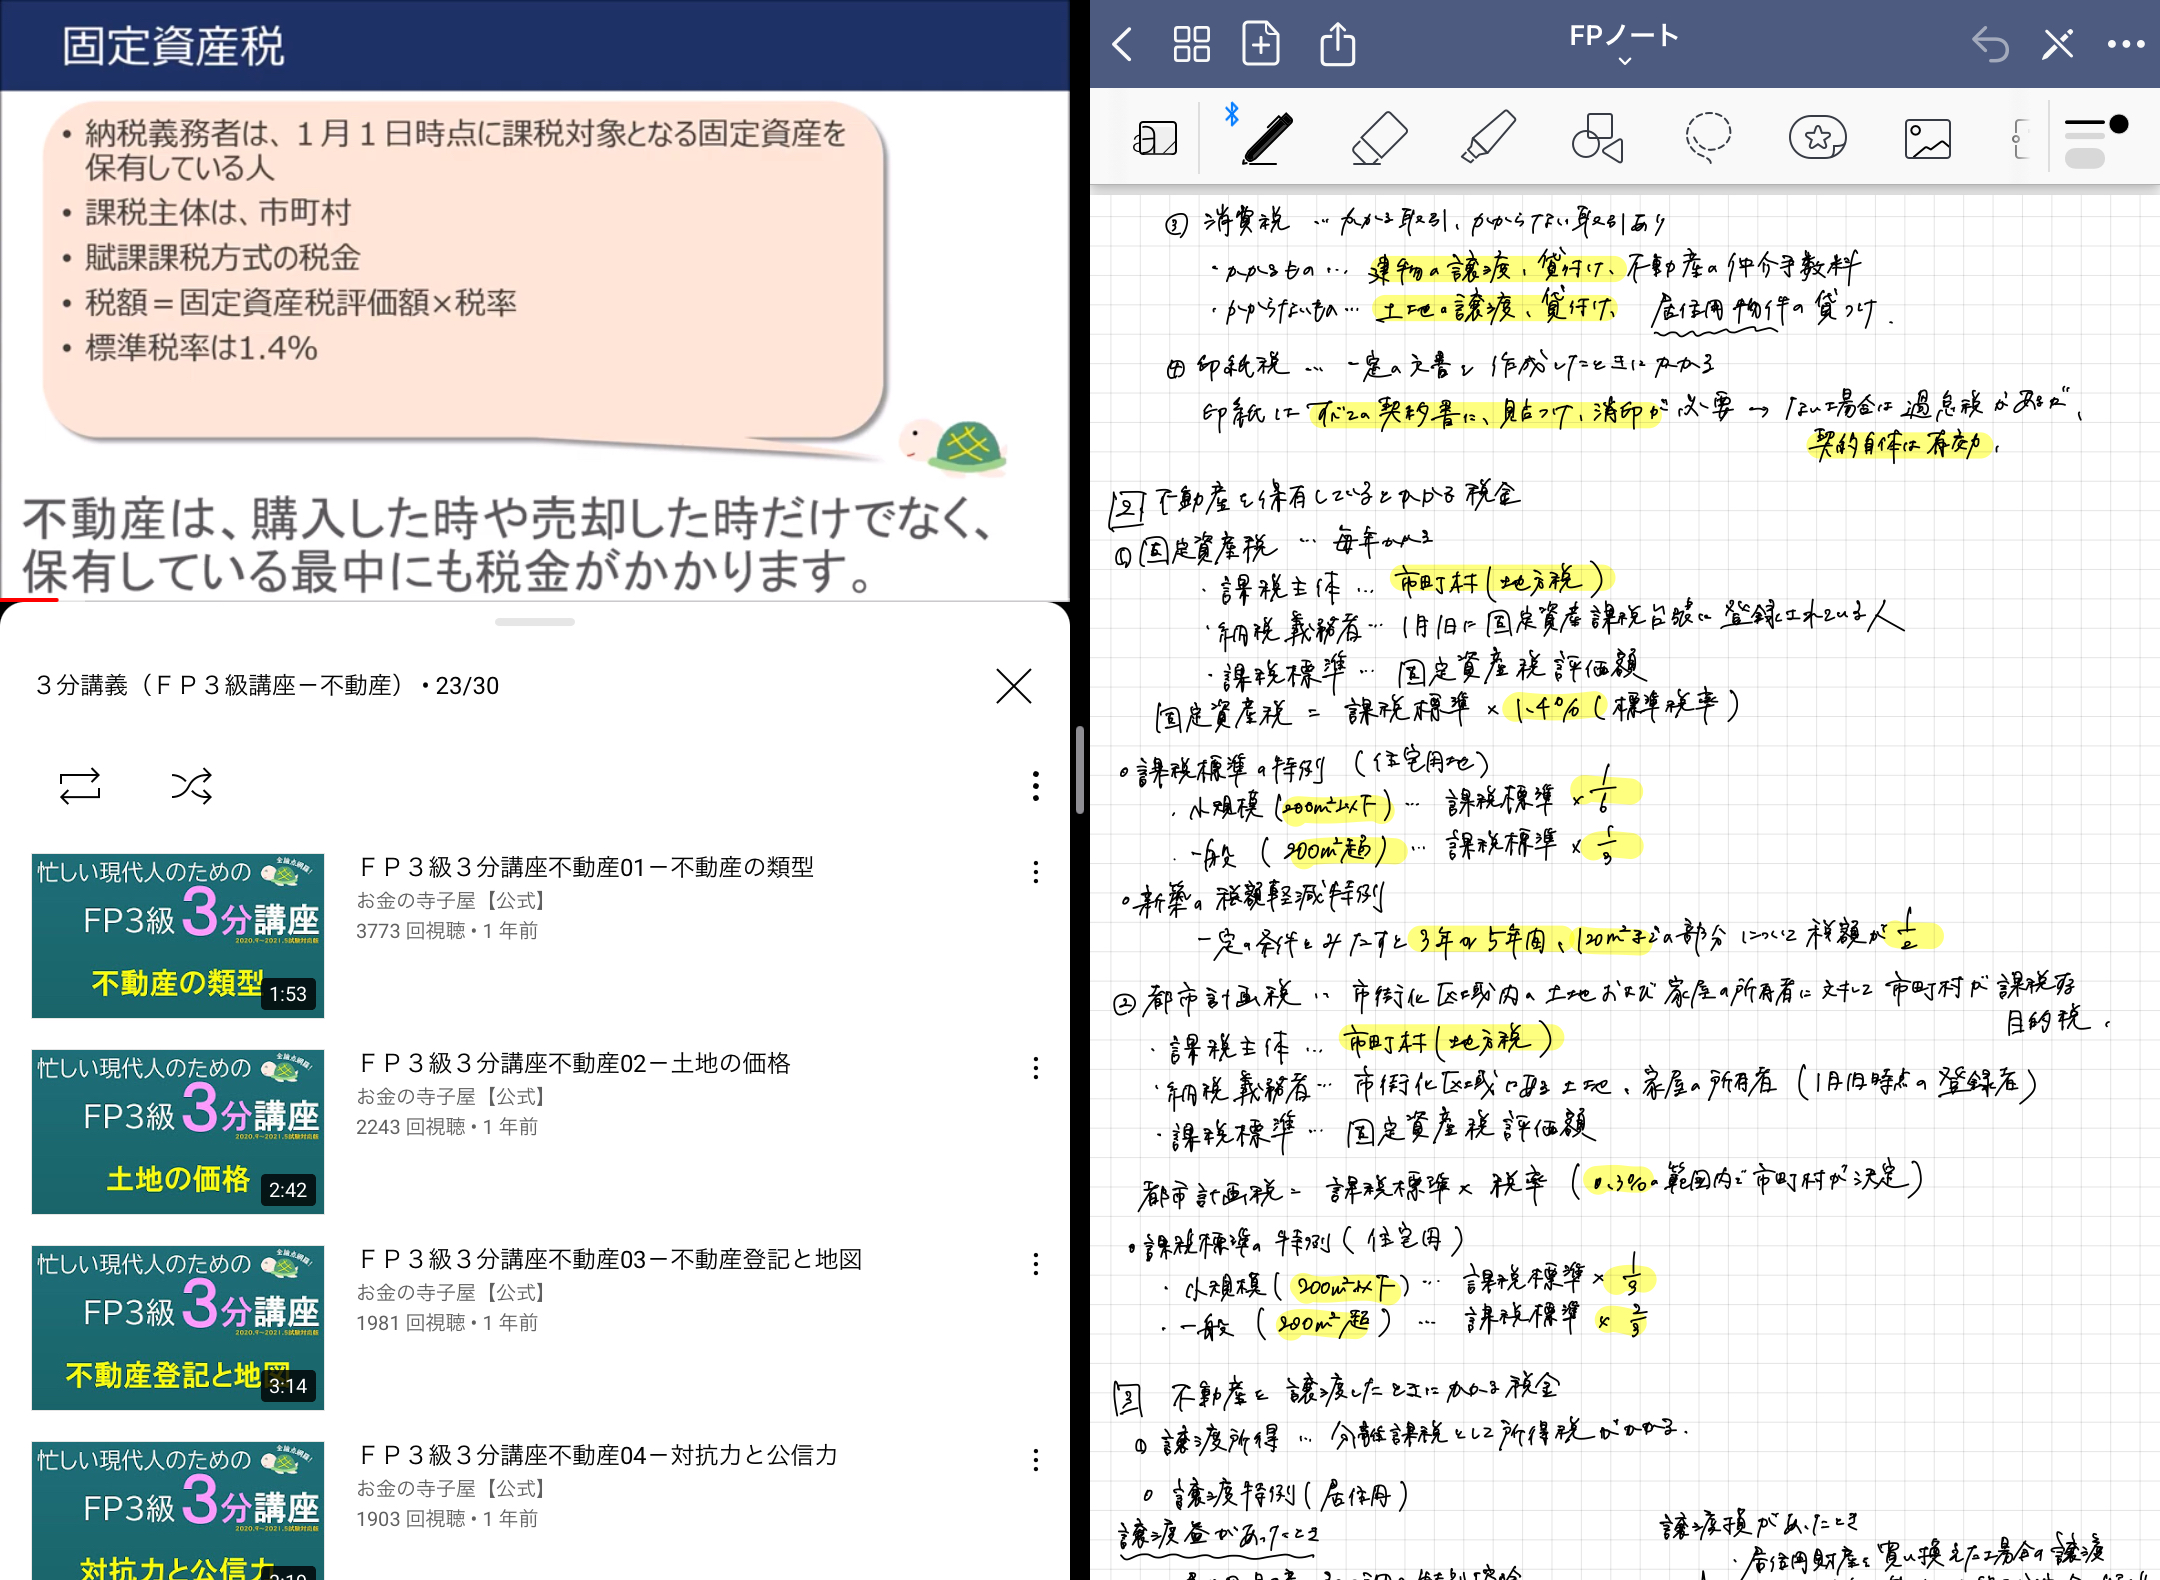 iPadで資格勉強する際の画面例2